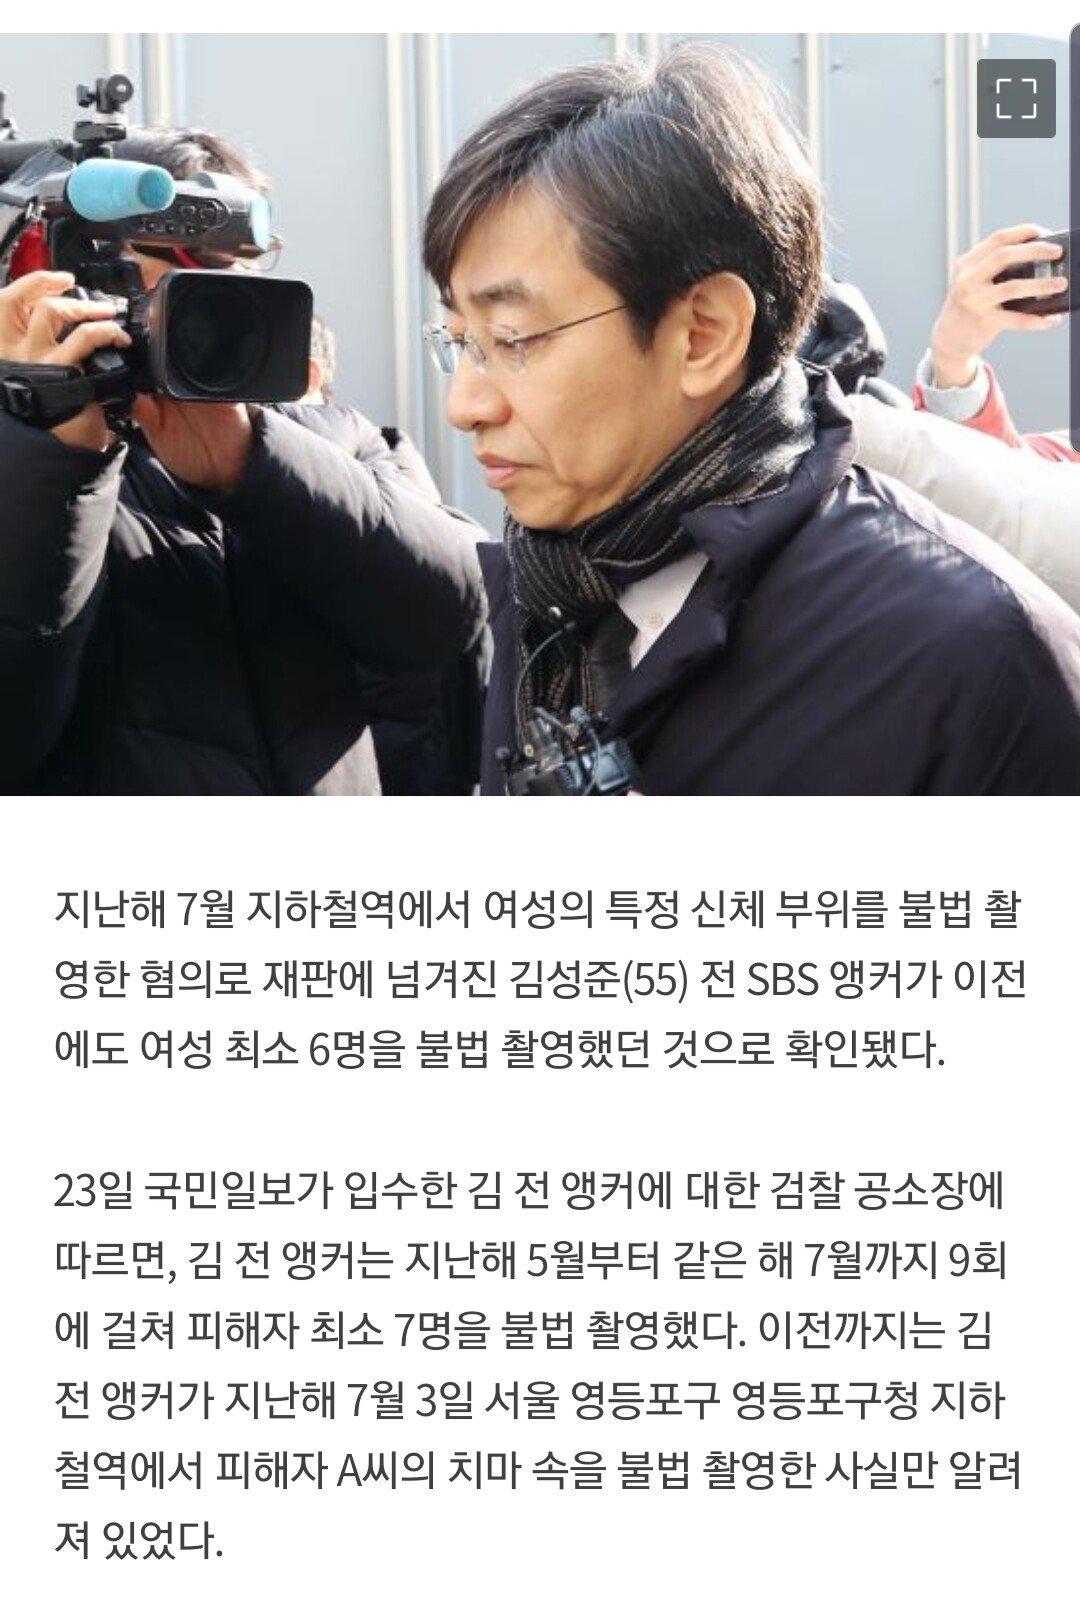 Screenshot_20200123-195114_Samsung Internet.jpg [단독] 김성준 \'치맛속 몰카\' 한번이 아니었다..피해자 최소 7명